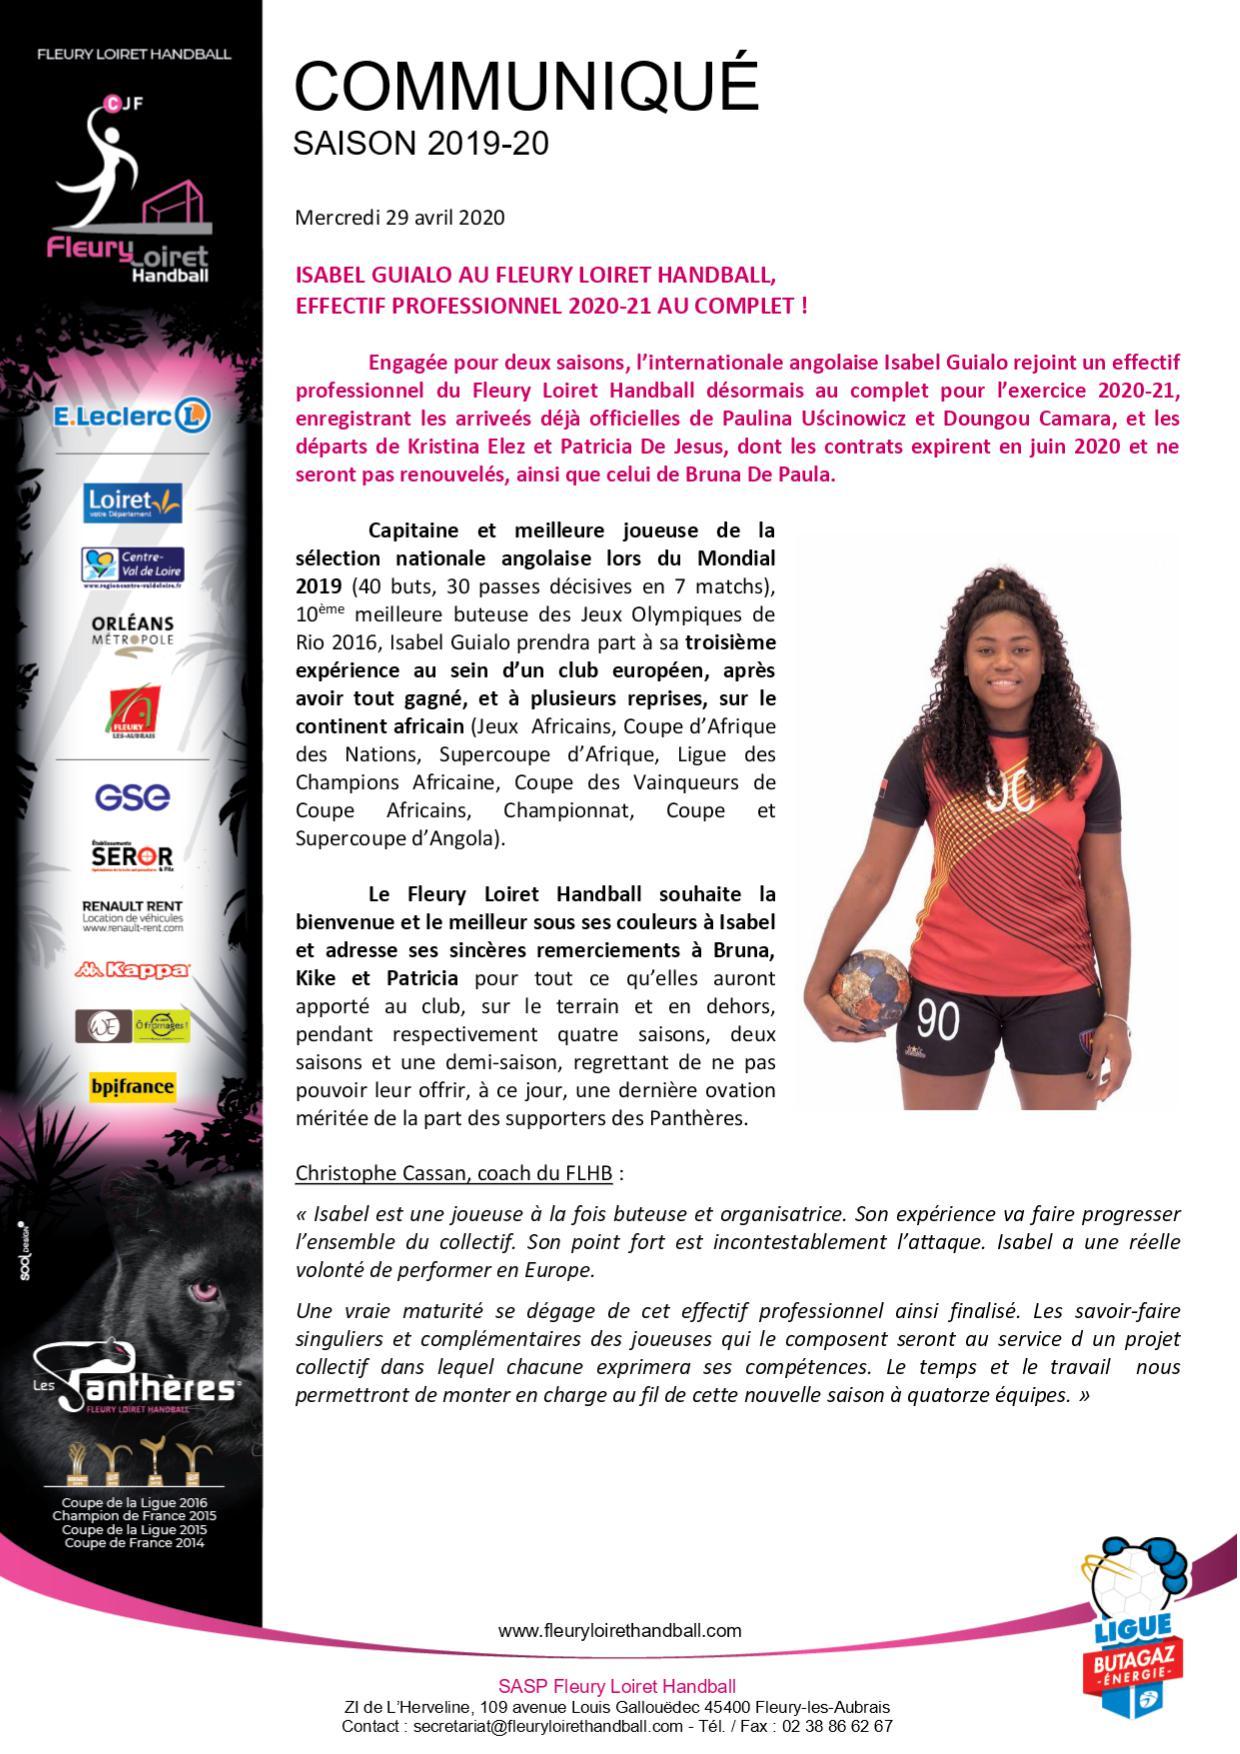 Aout 2015 - Communiqué Fleury Loiret Handball - Mercredi 29 avril 20201.jpg